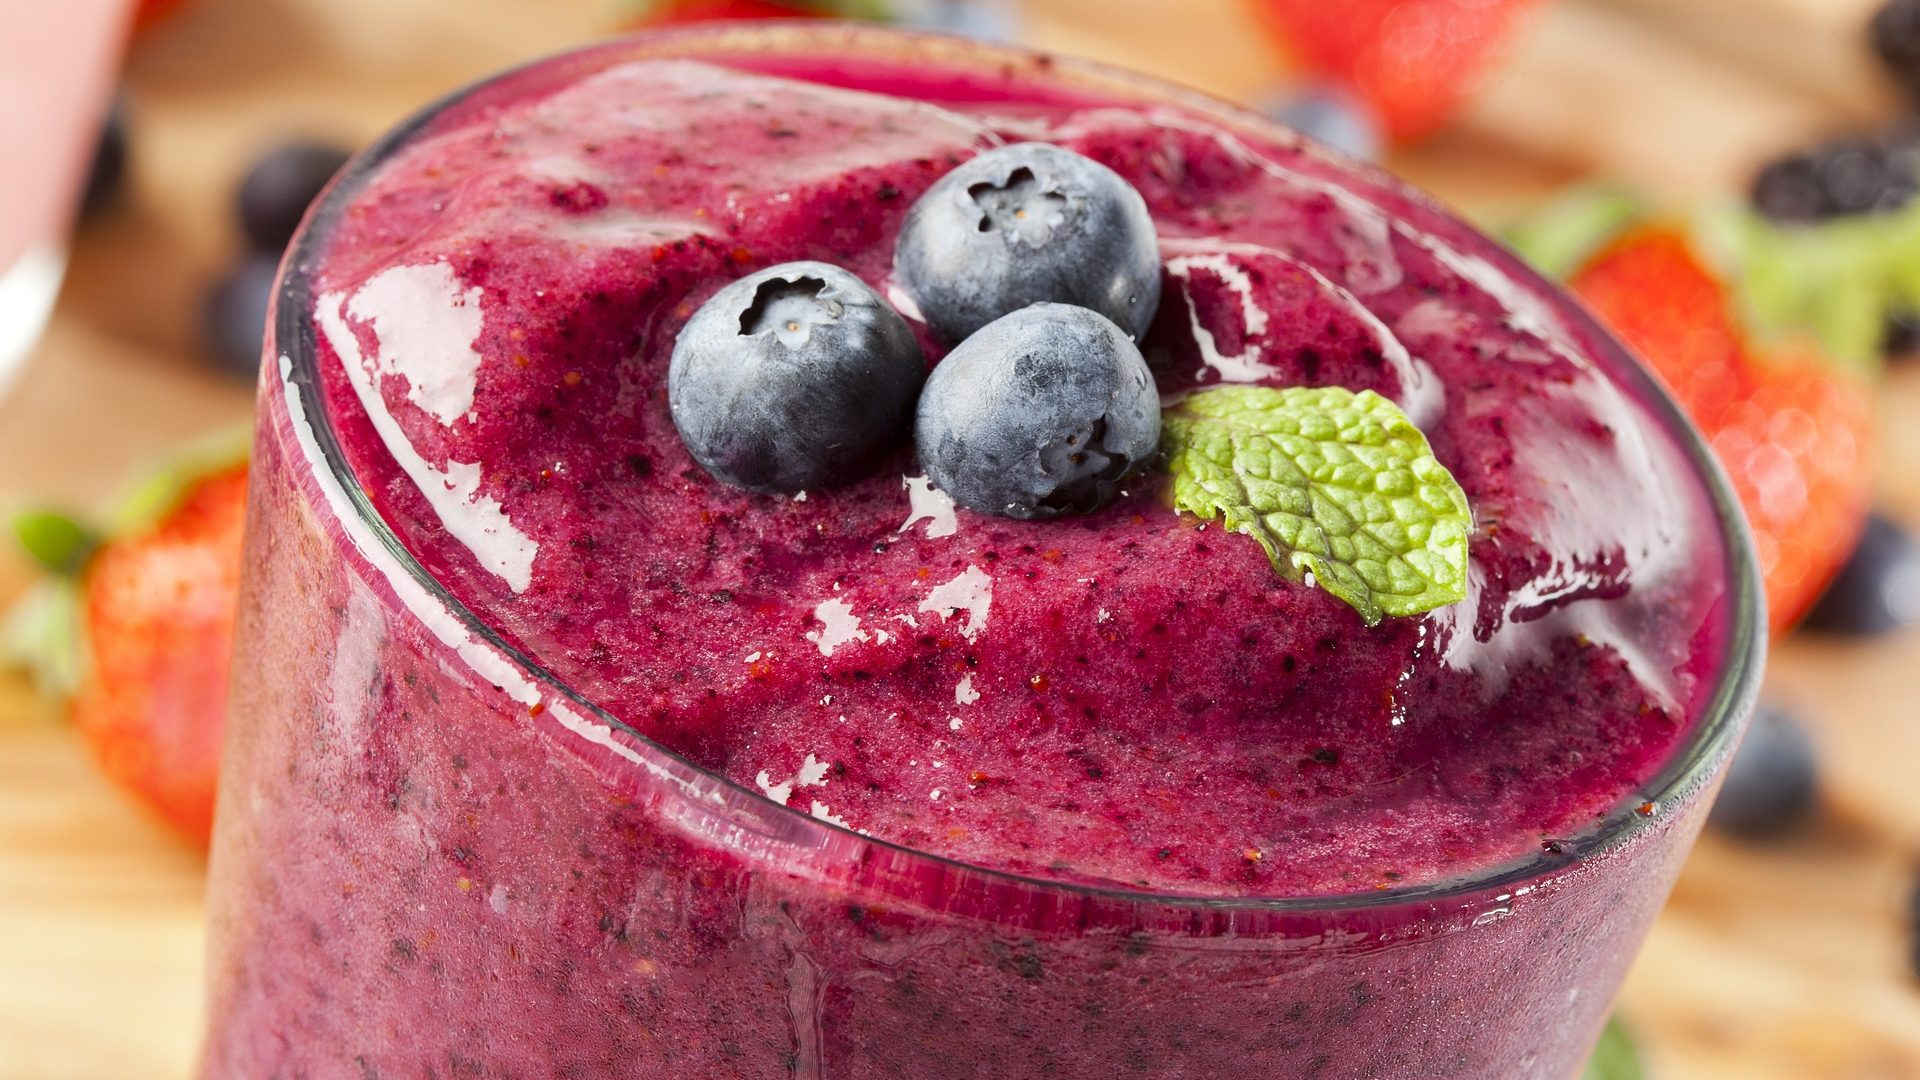 blueberry-2350367_1920